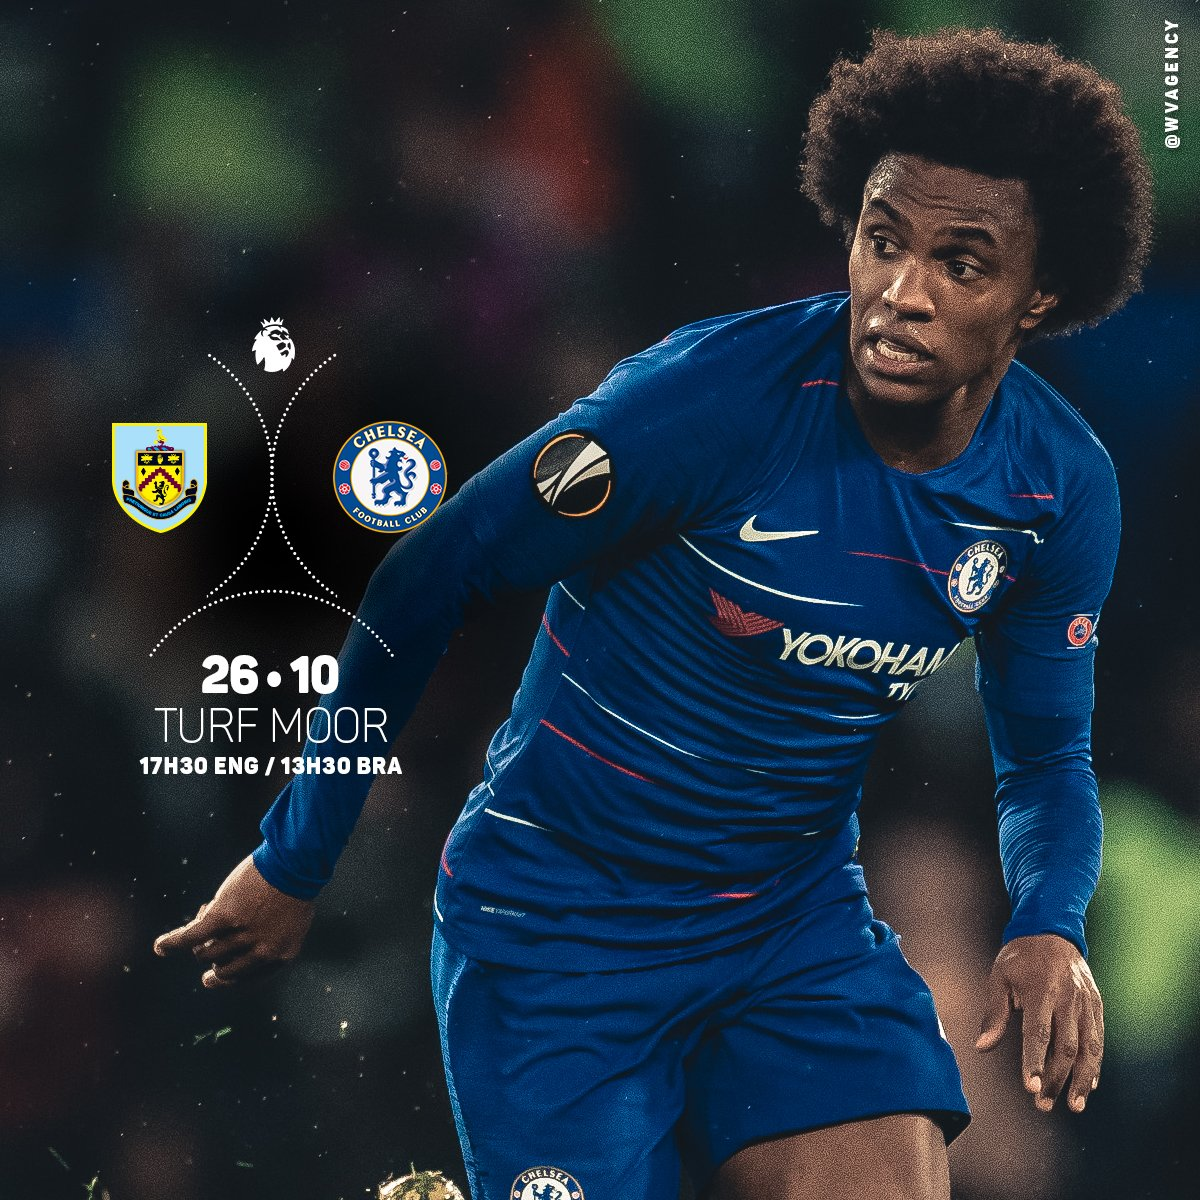 One more battle! Come on Chelsea!!! 💪🏿⚽️💙#matchday #premierleague #CFC #comeonchelsea #W10